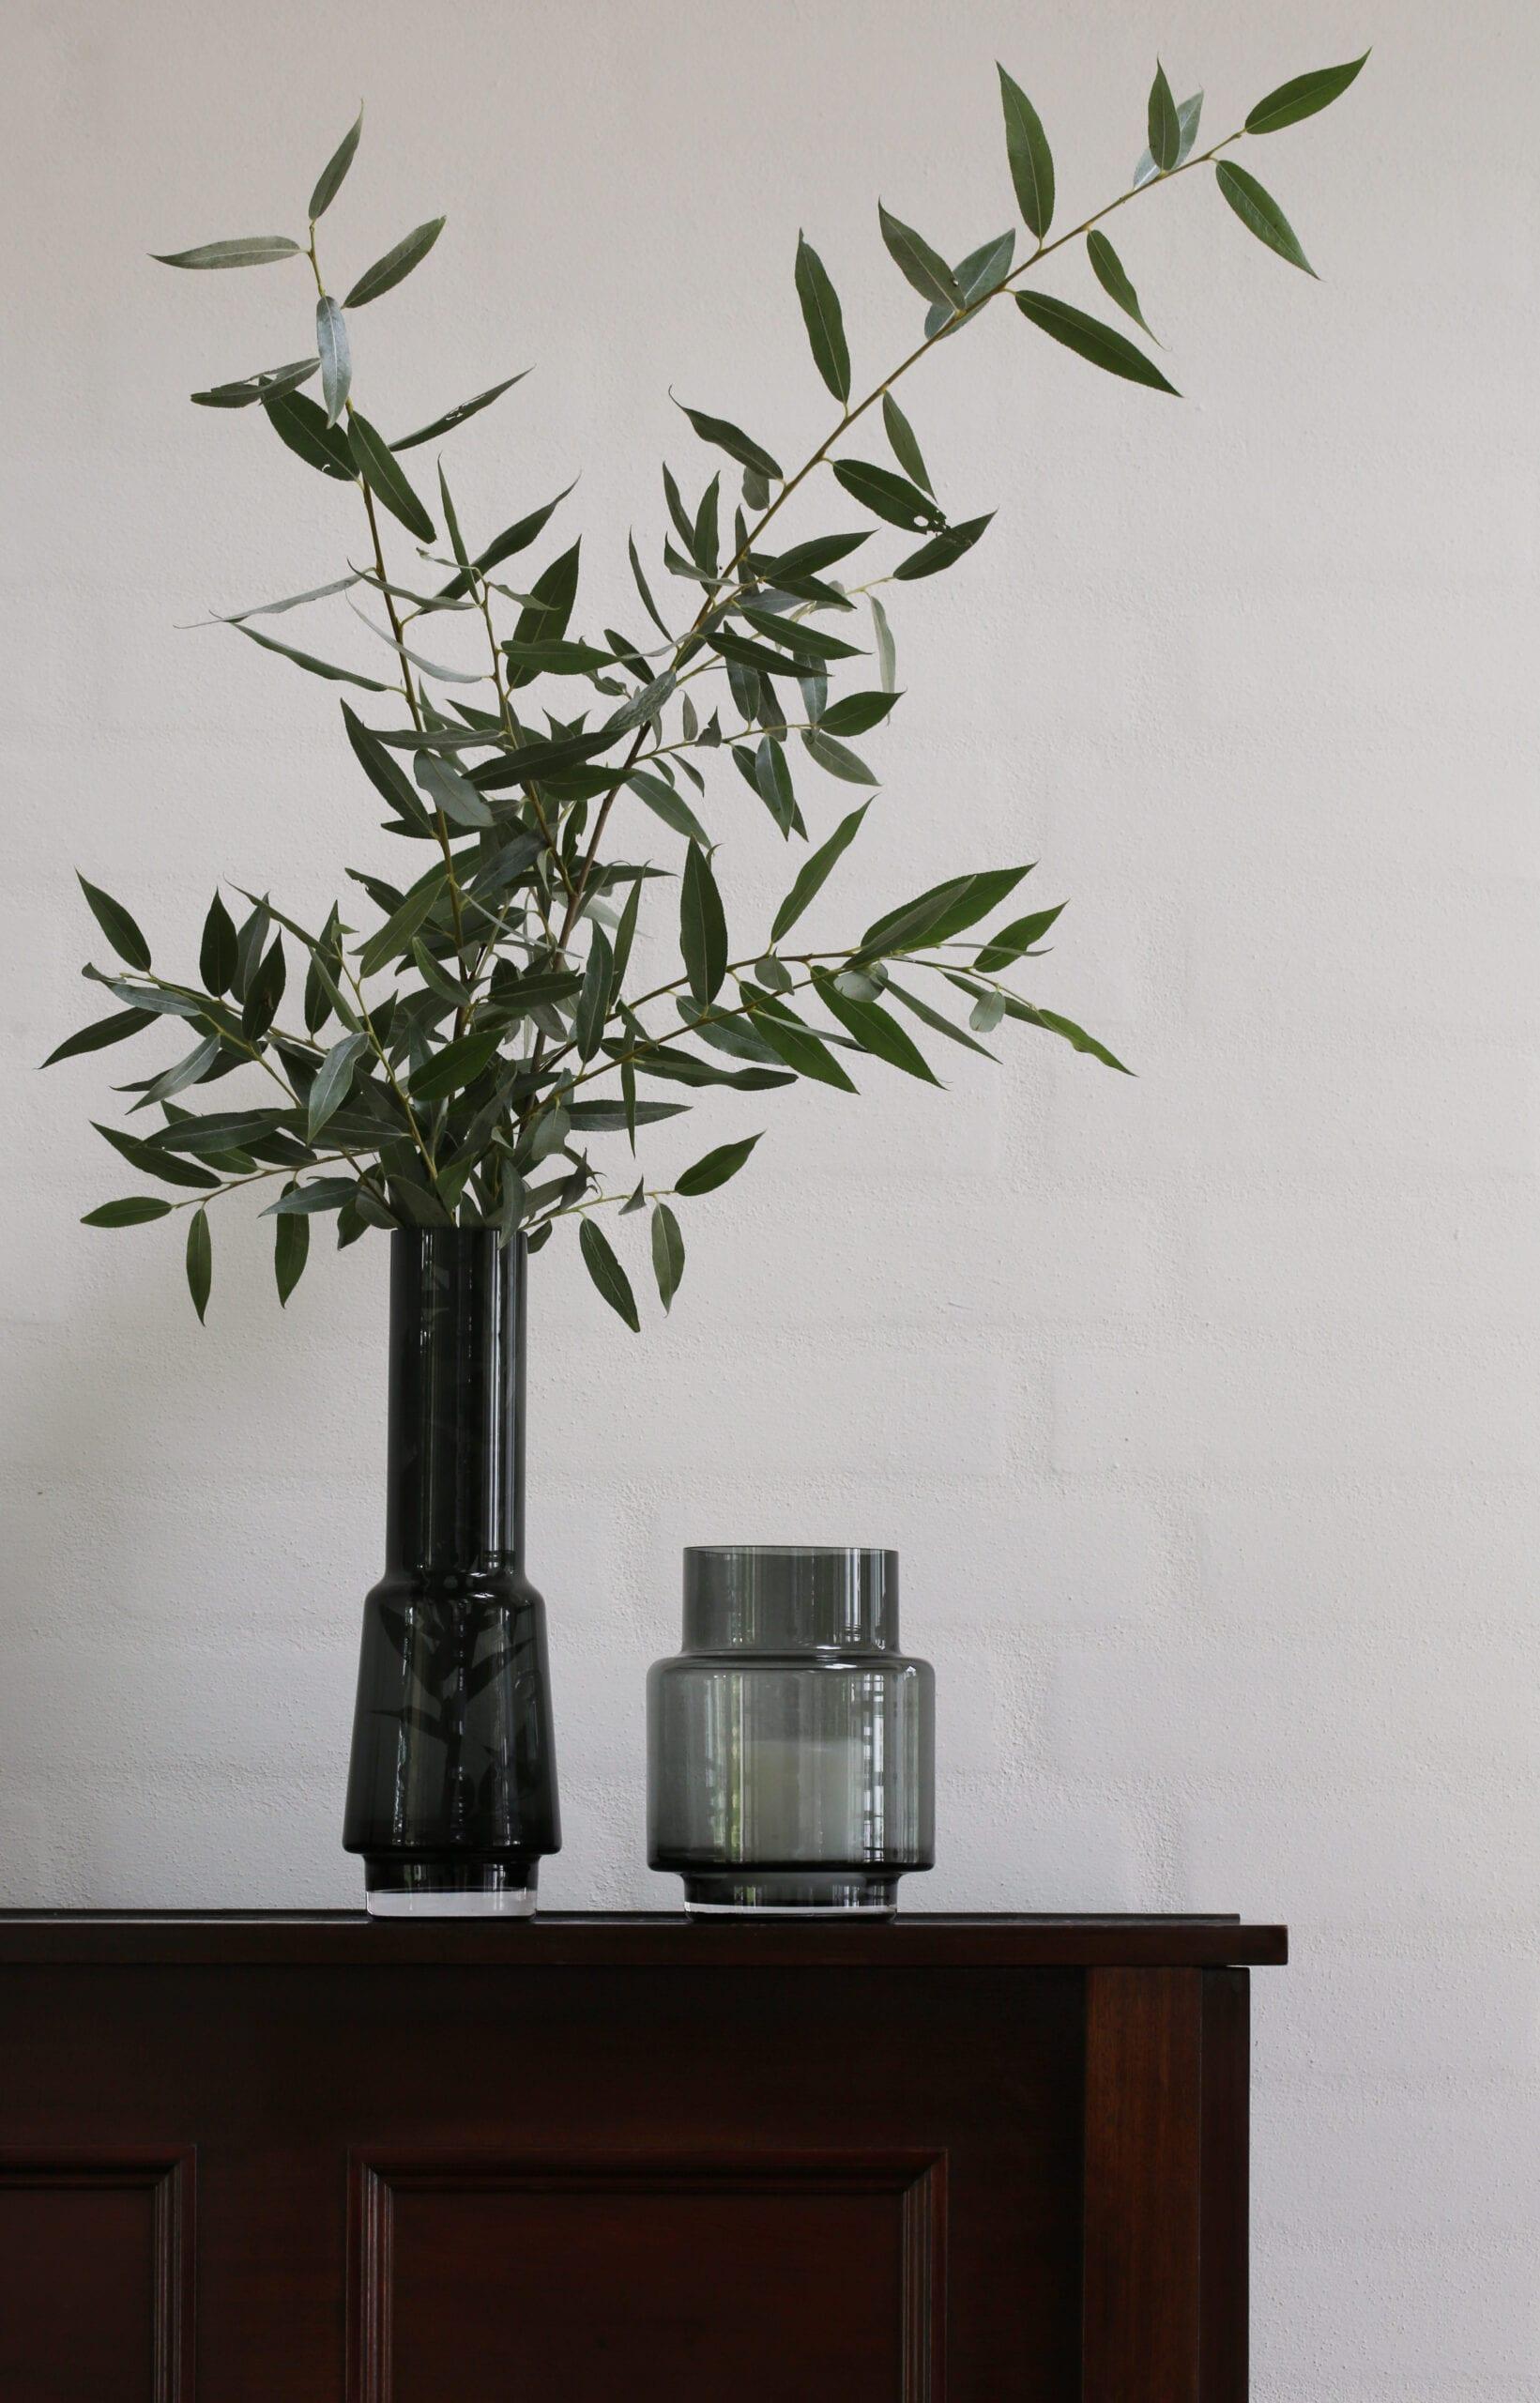 Hurricane vase Ro collection boligtilbehør